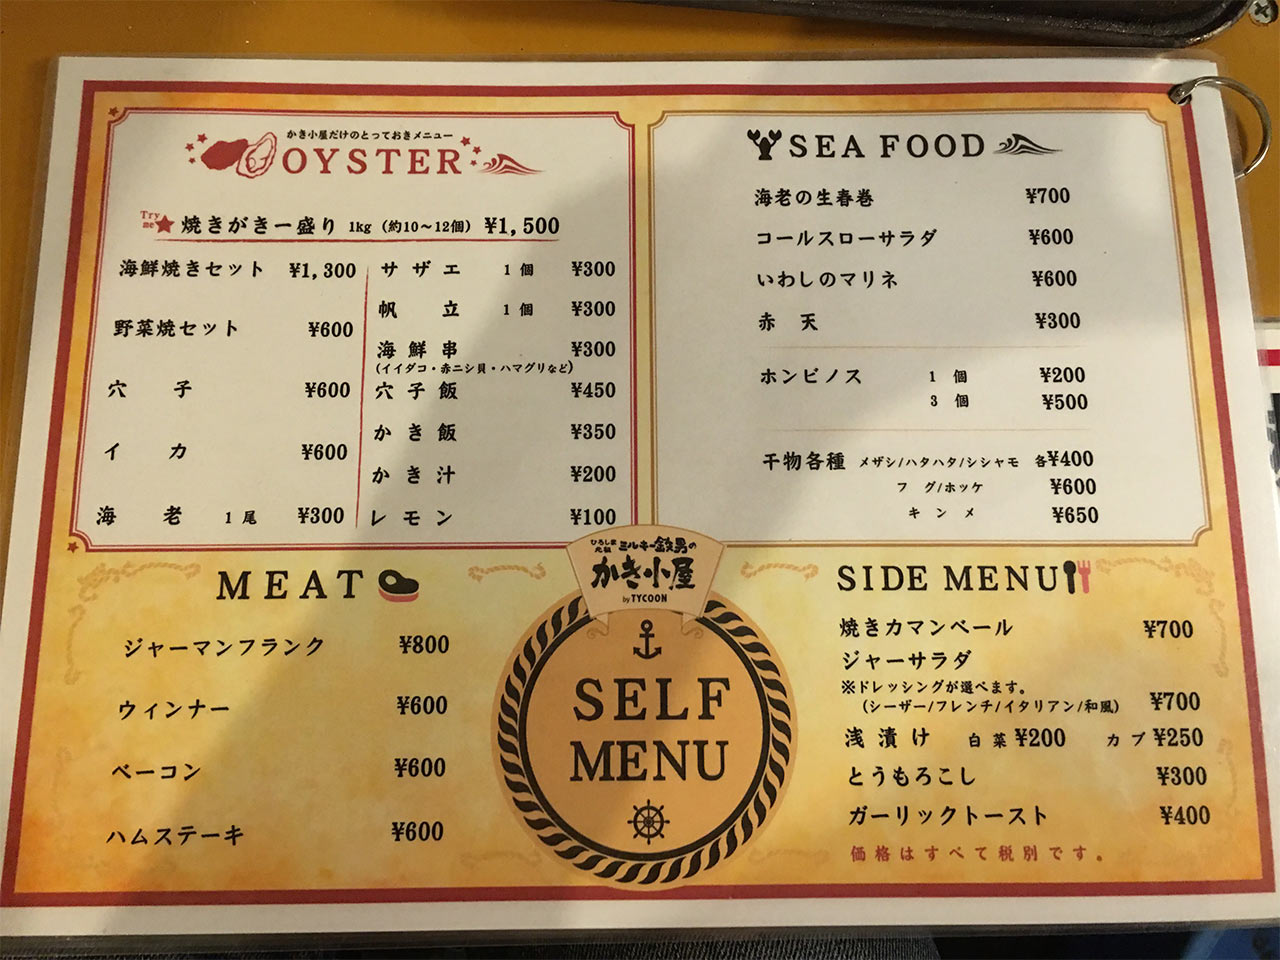 kaki-goya-tycoon-menu01